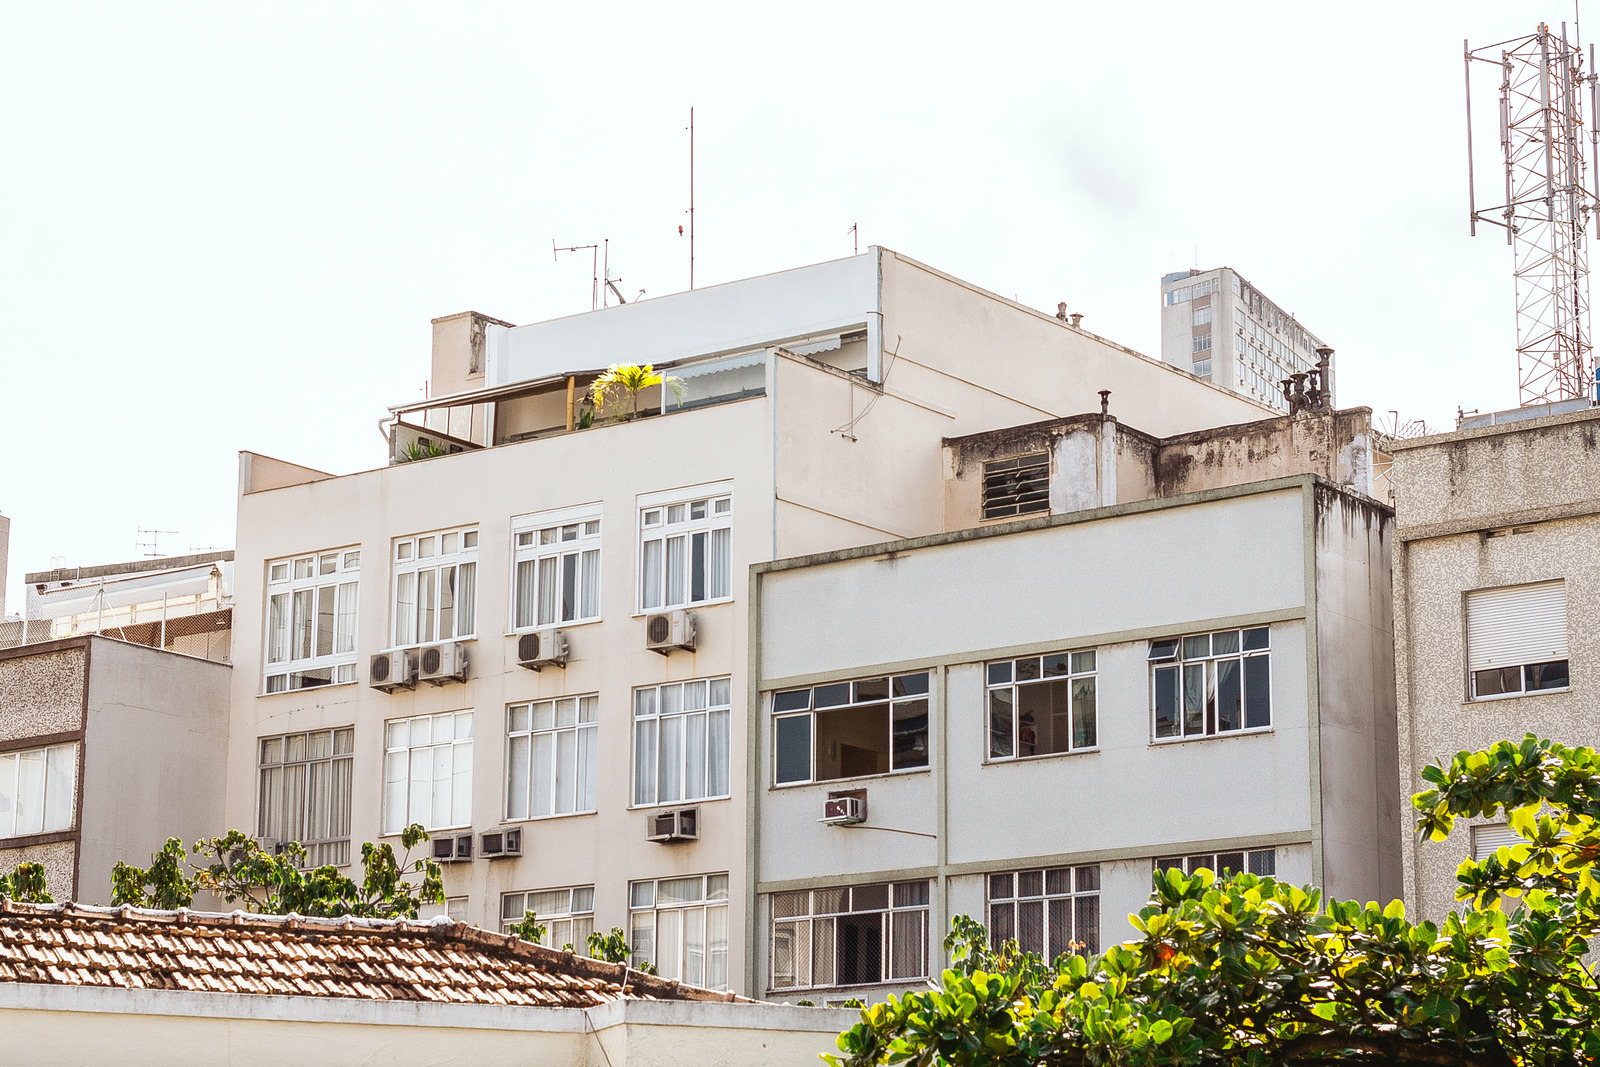 Immeuble - Cotonou - Bénin